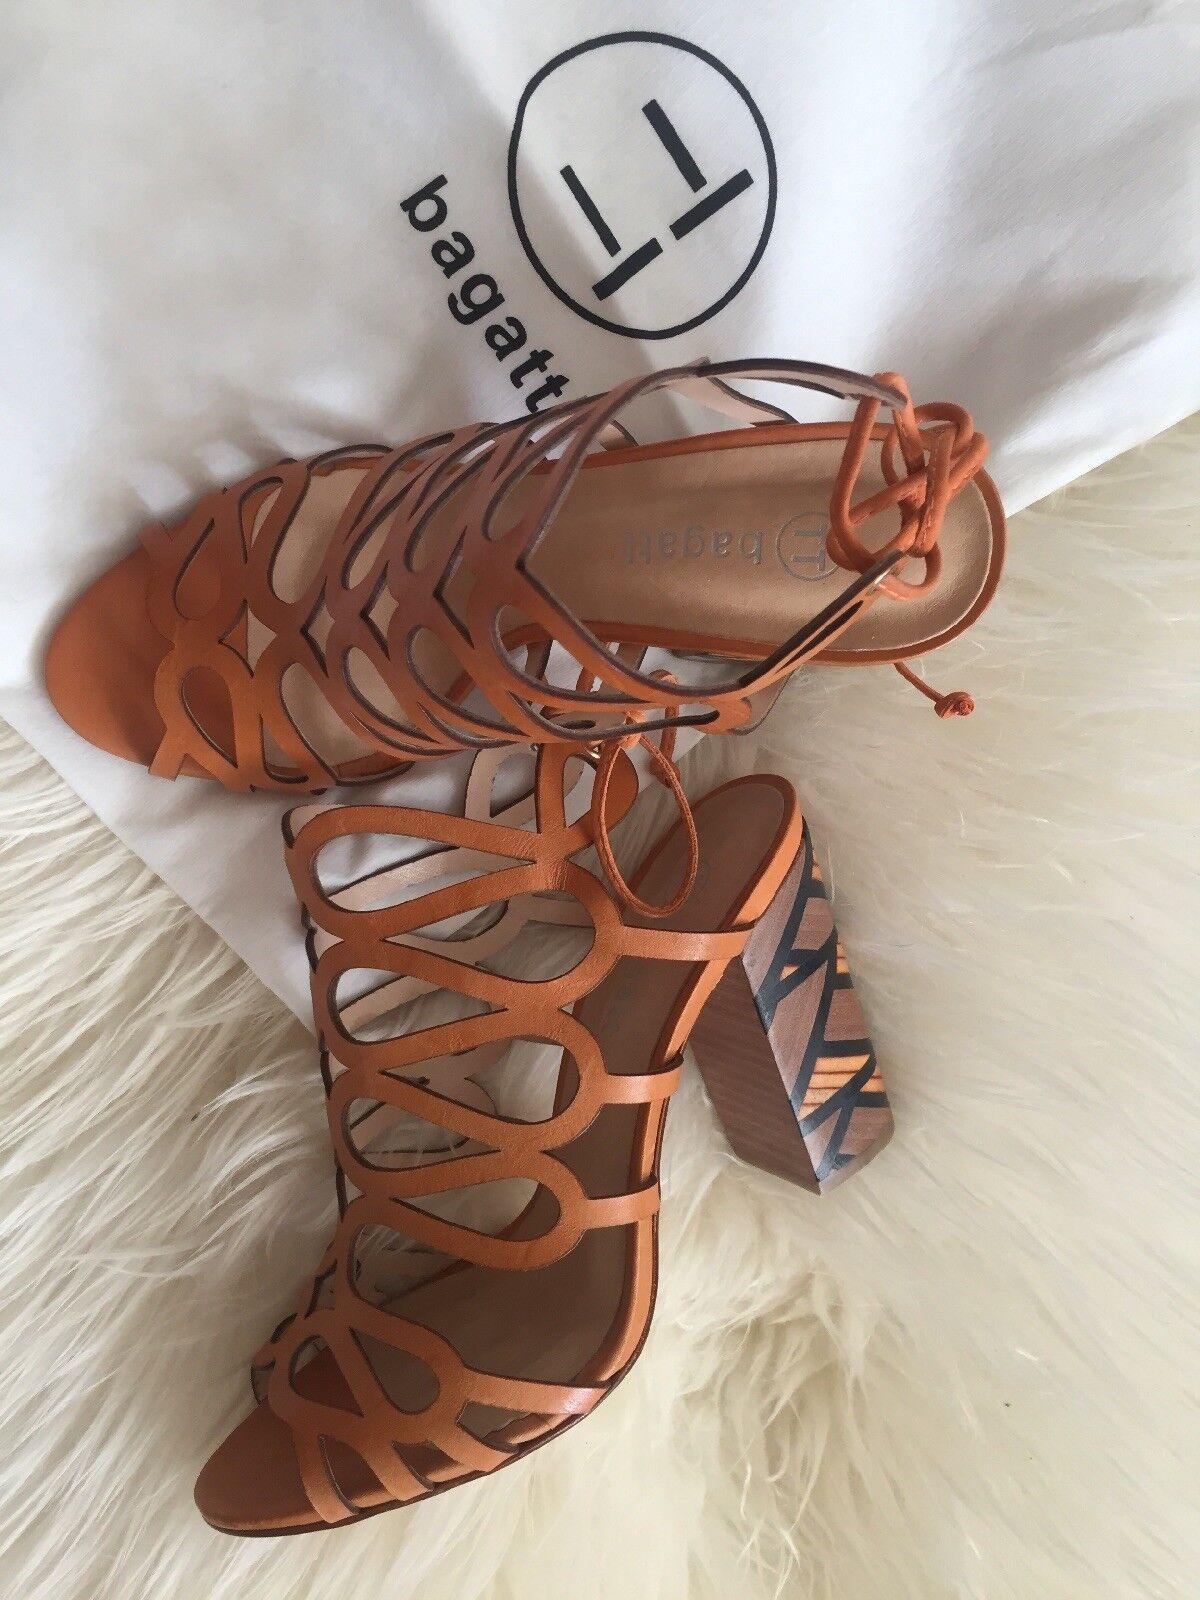 Bagatt hermosa señora sandalias, muy zapatos de piel naranja oscuro